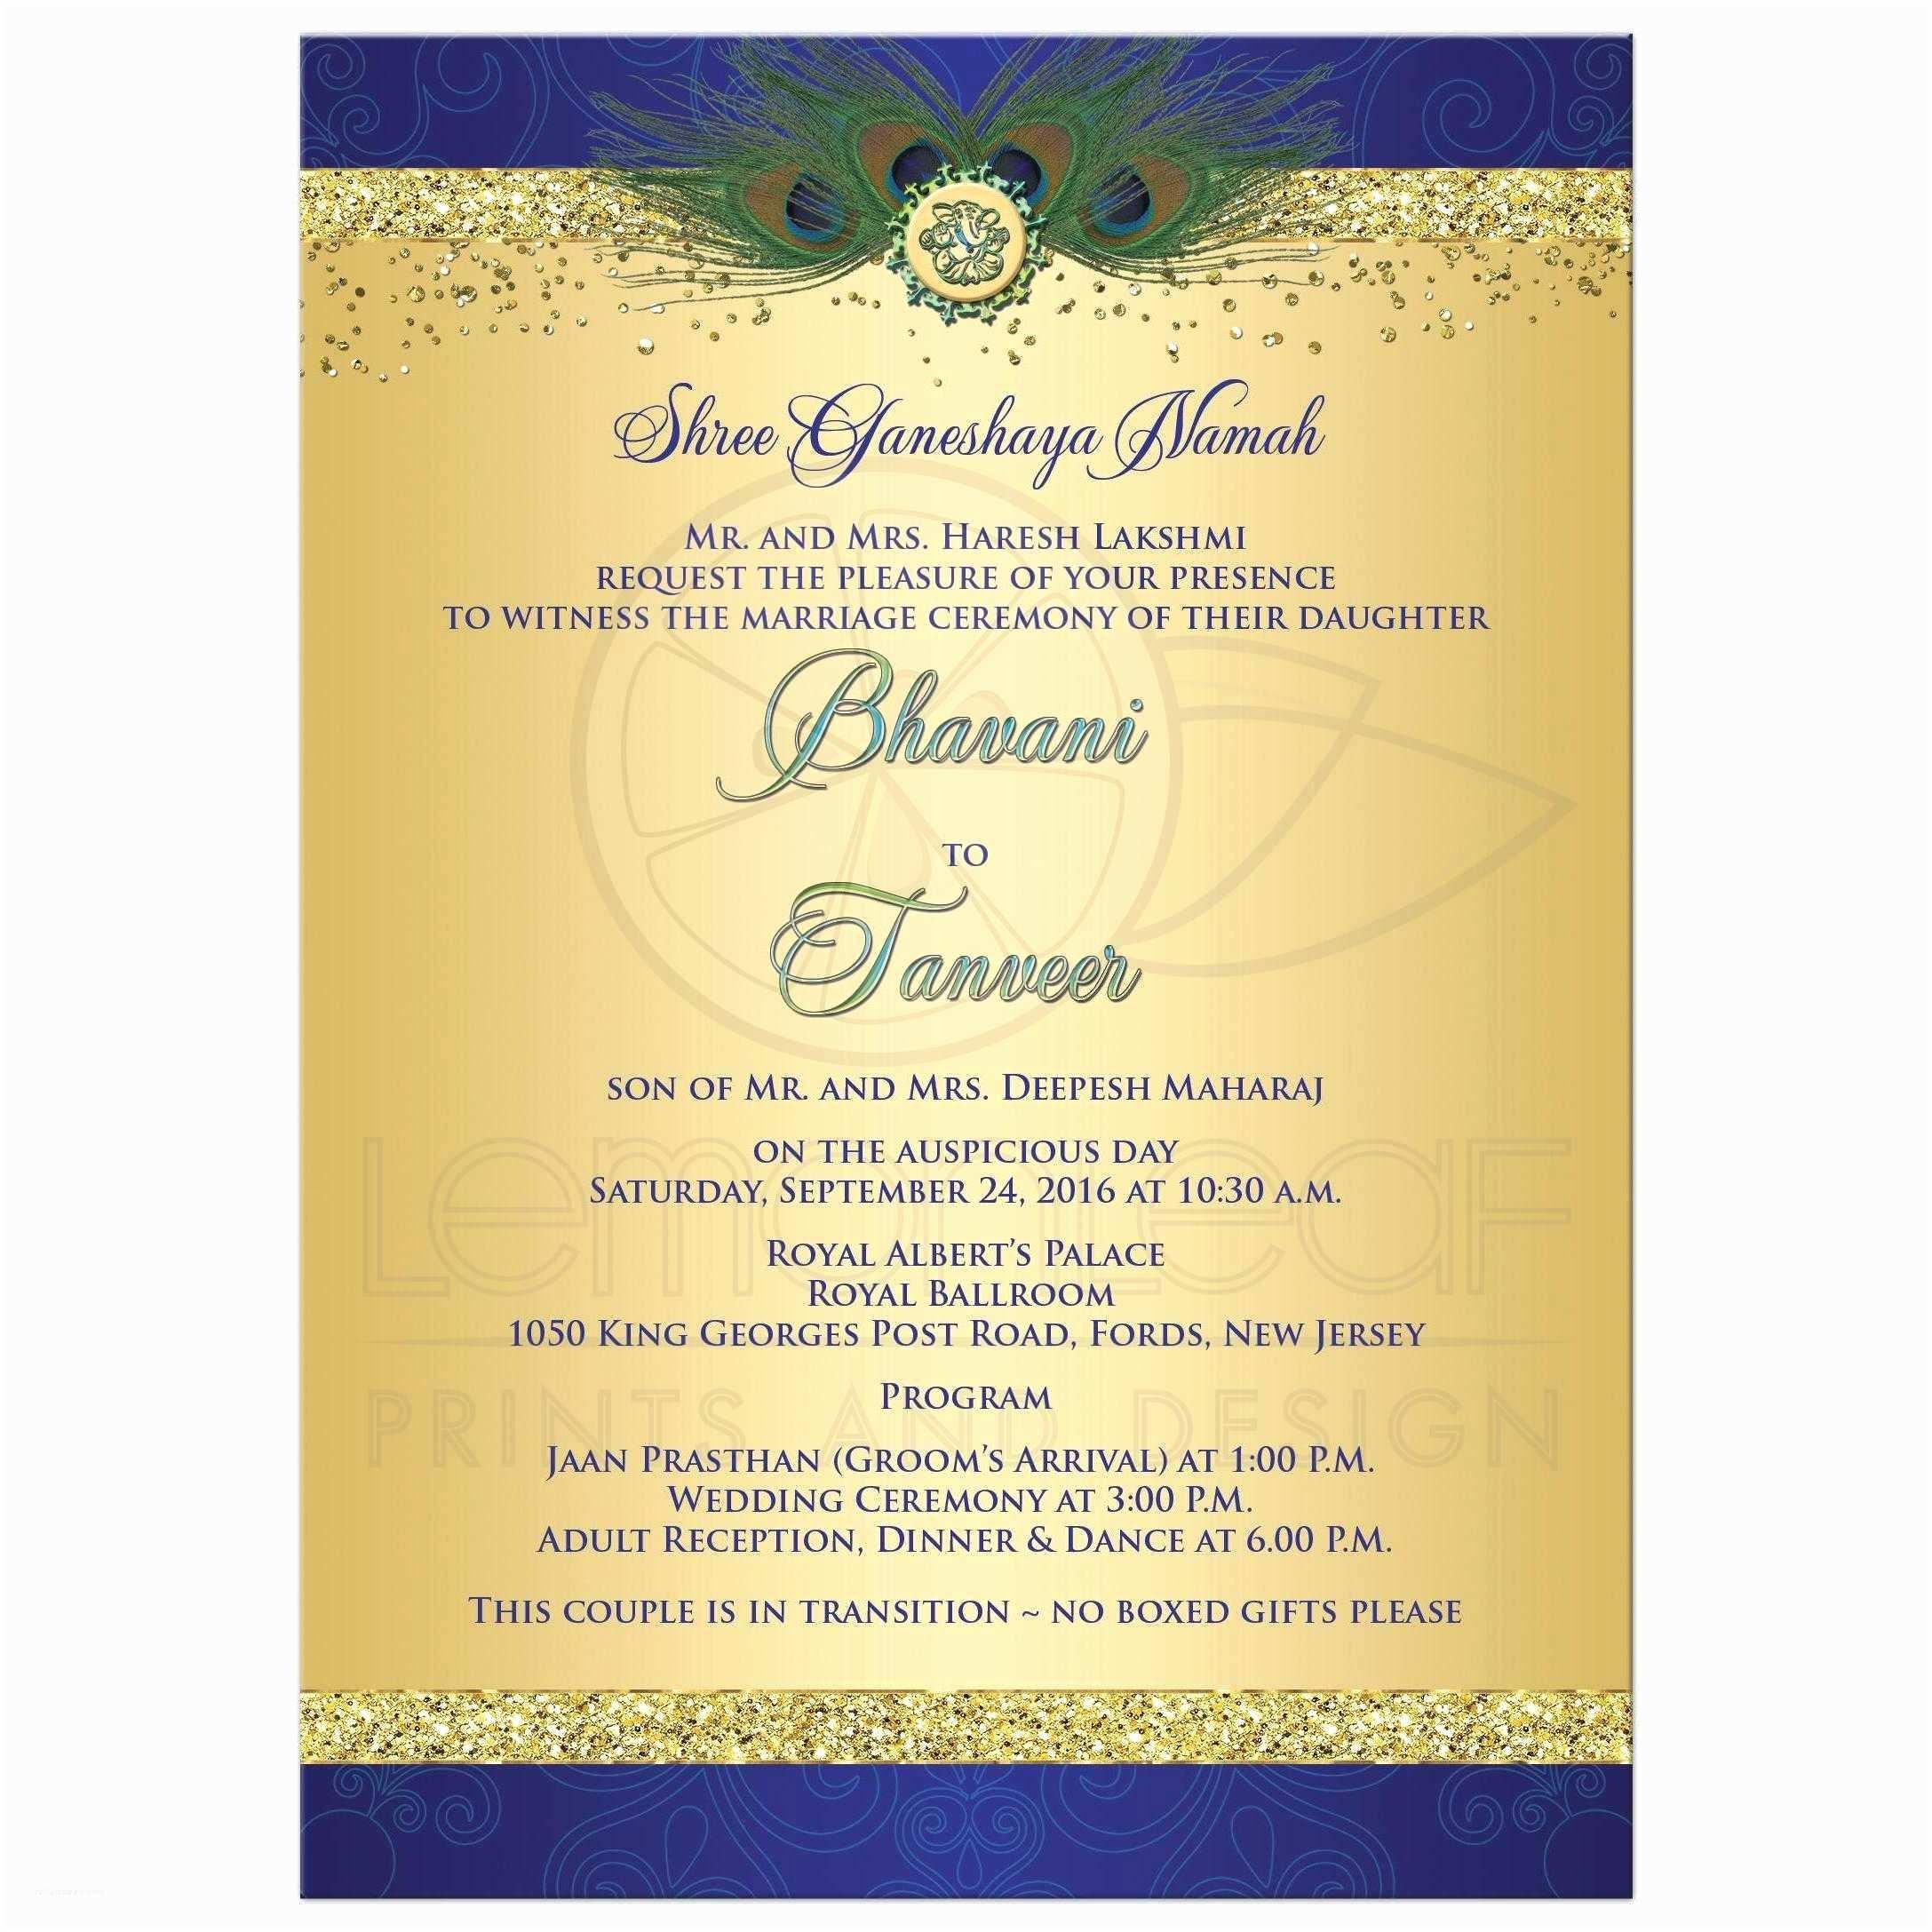 Indian Wedding Reception Invitation Templates Invitation Cards Reception Inspirationa Indian Wedding